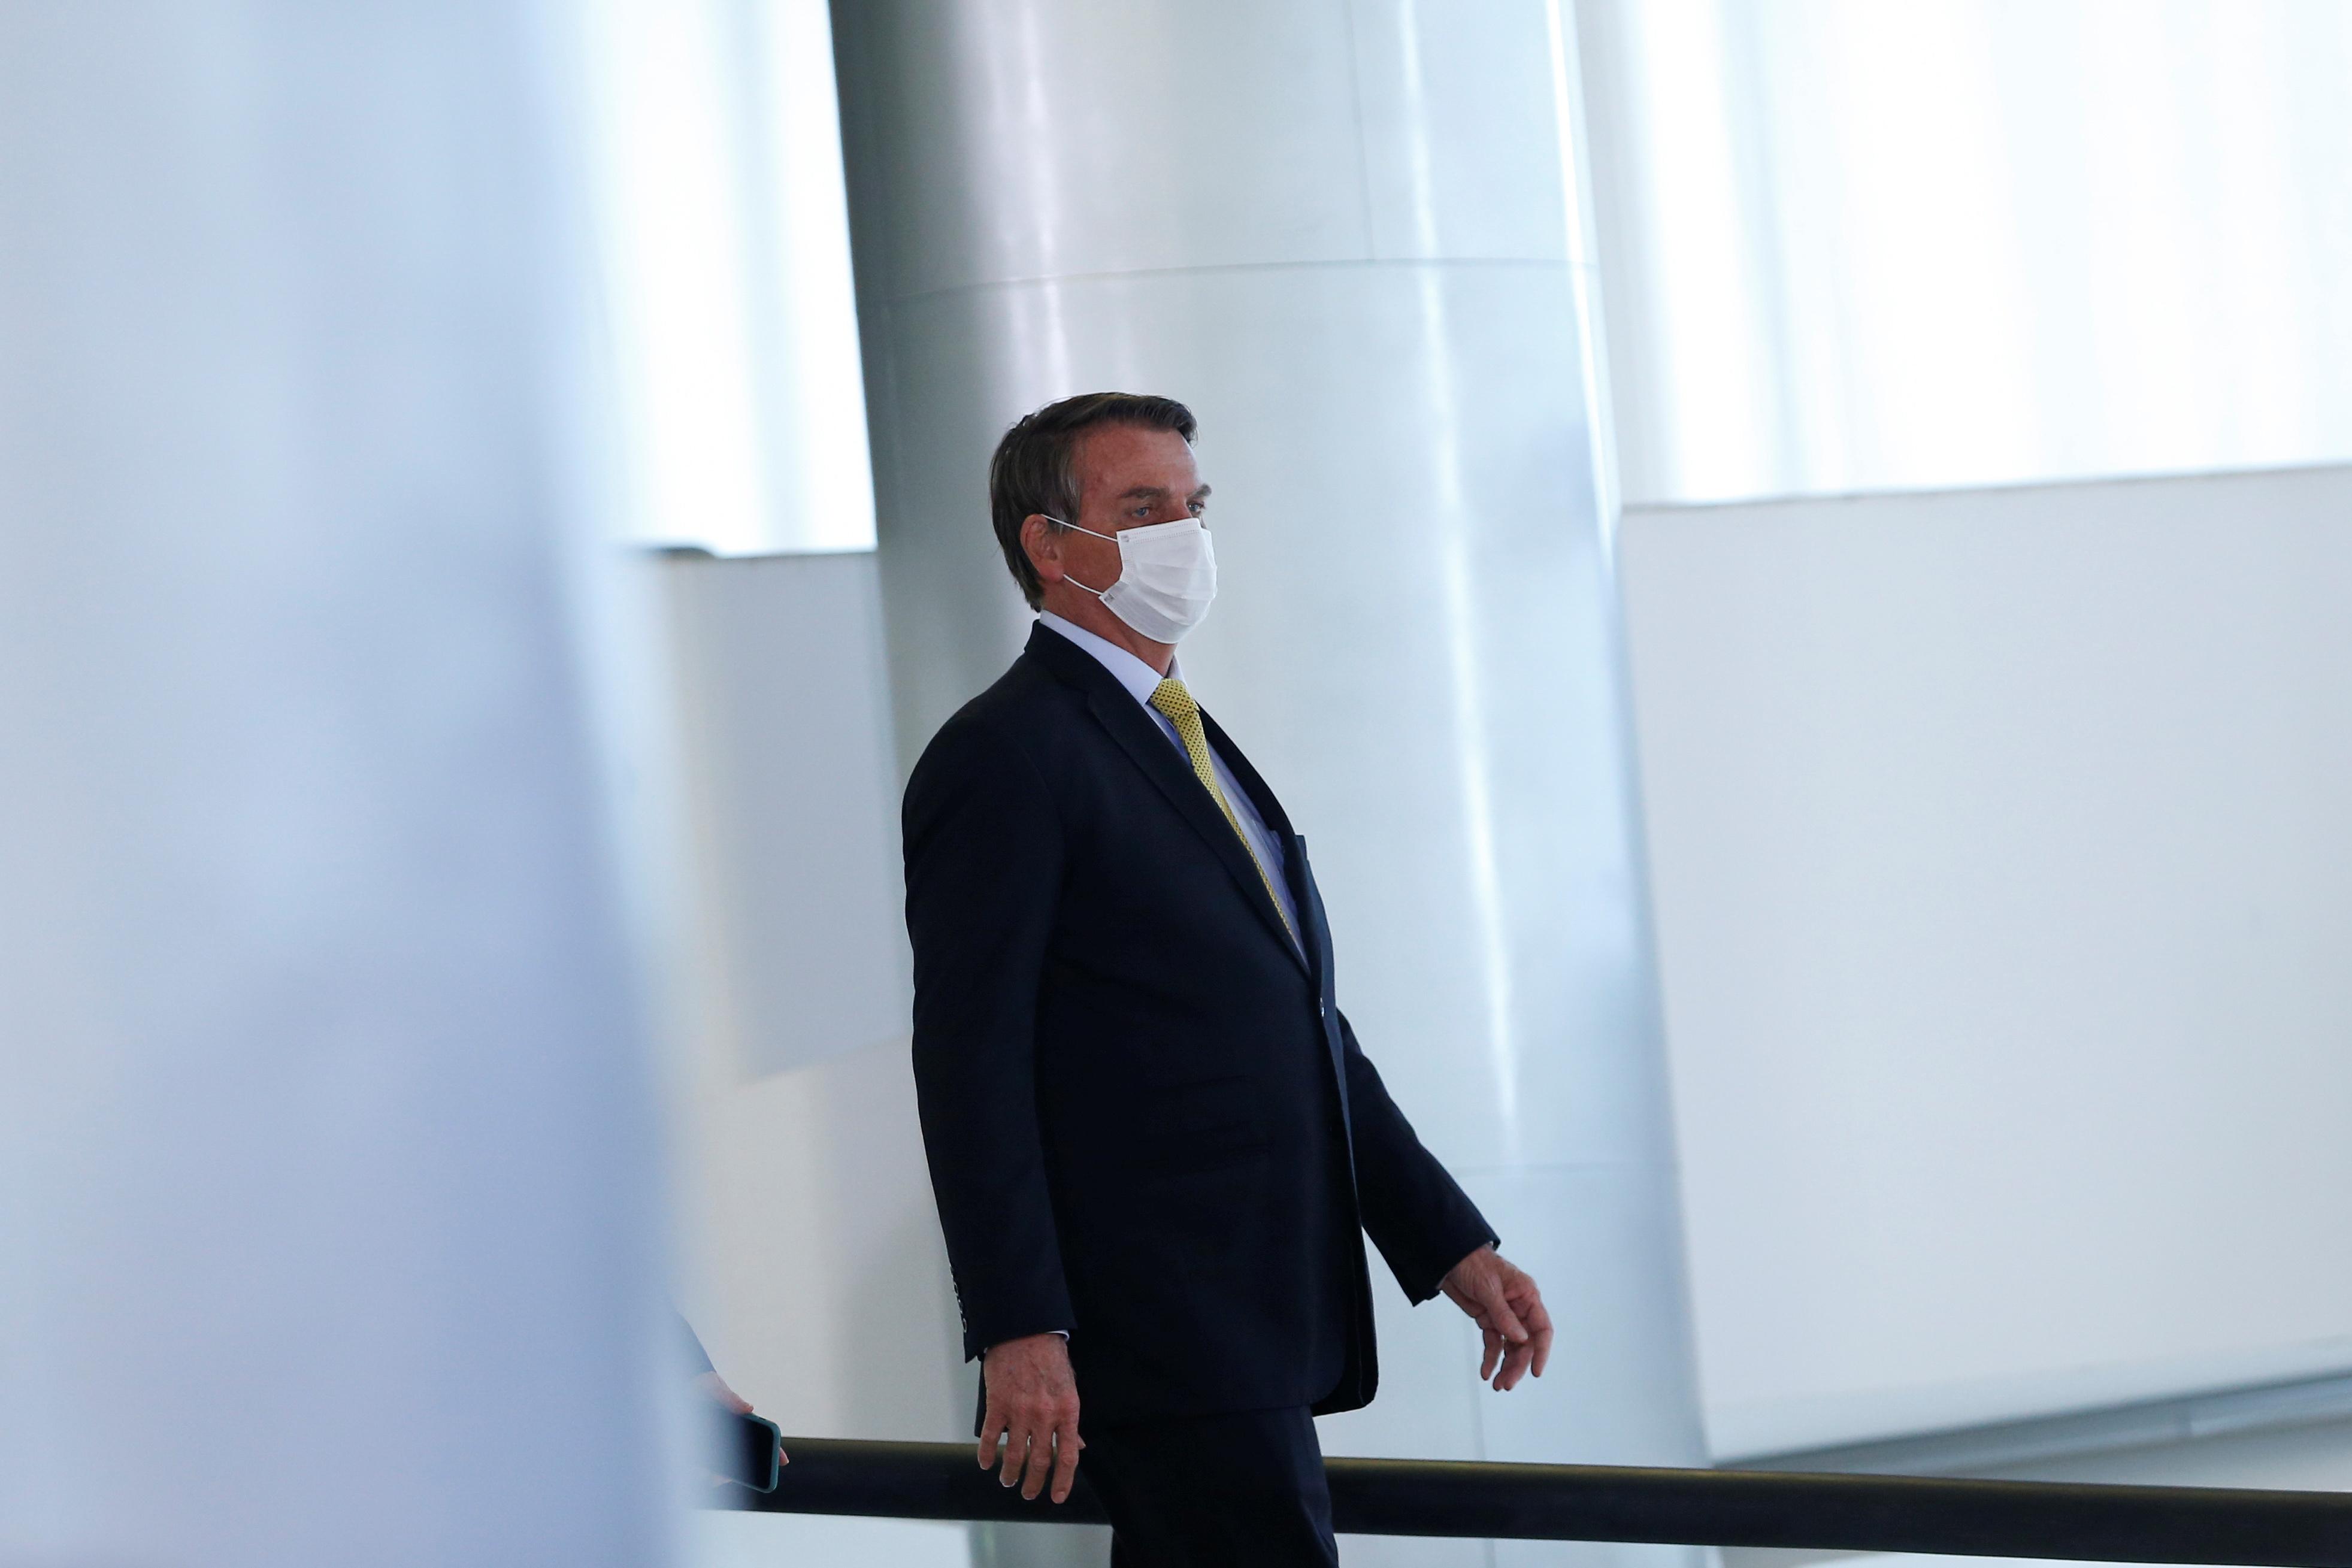 Brazil's President Jair Bolsonaro walks before a ceremony at the Planalto Palace in Brasilia, Brazil, June 29, 2021. REUTERS/Adriano Machado